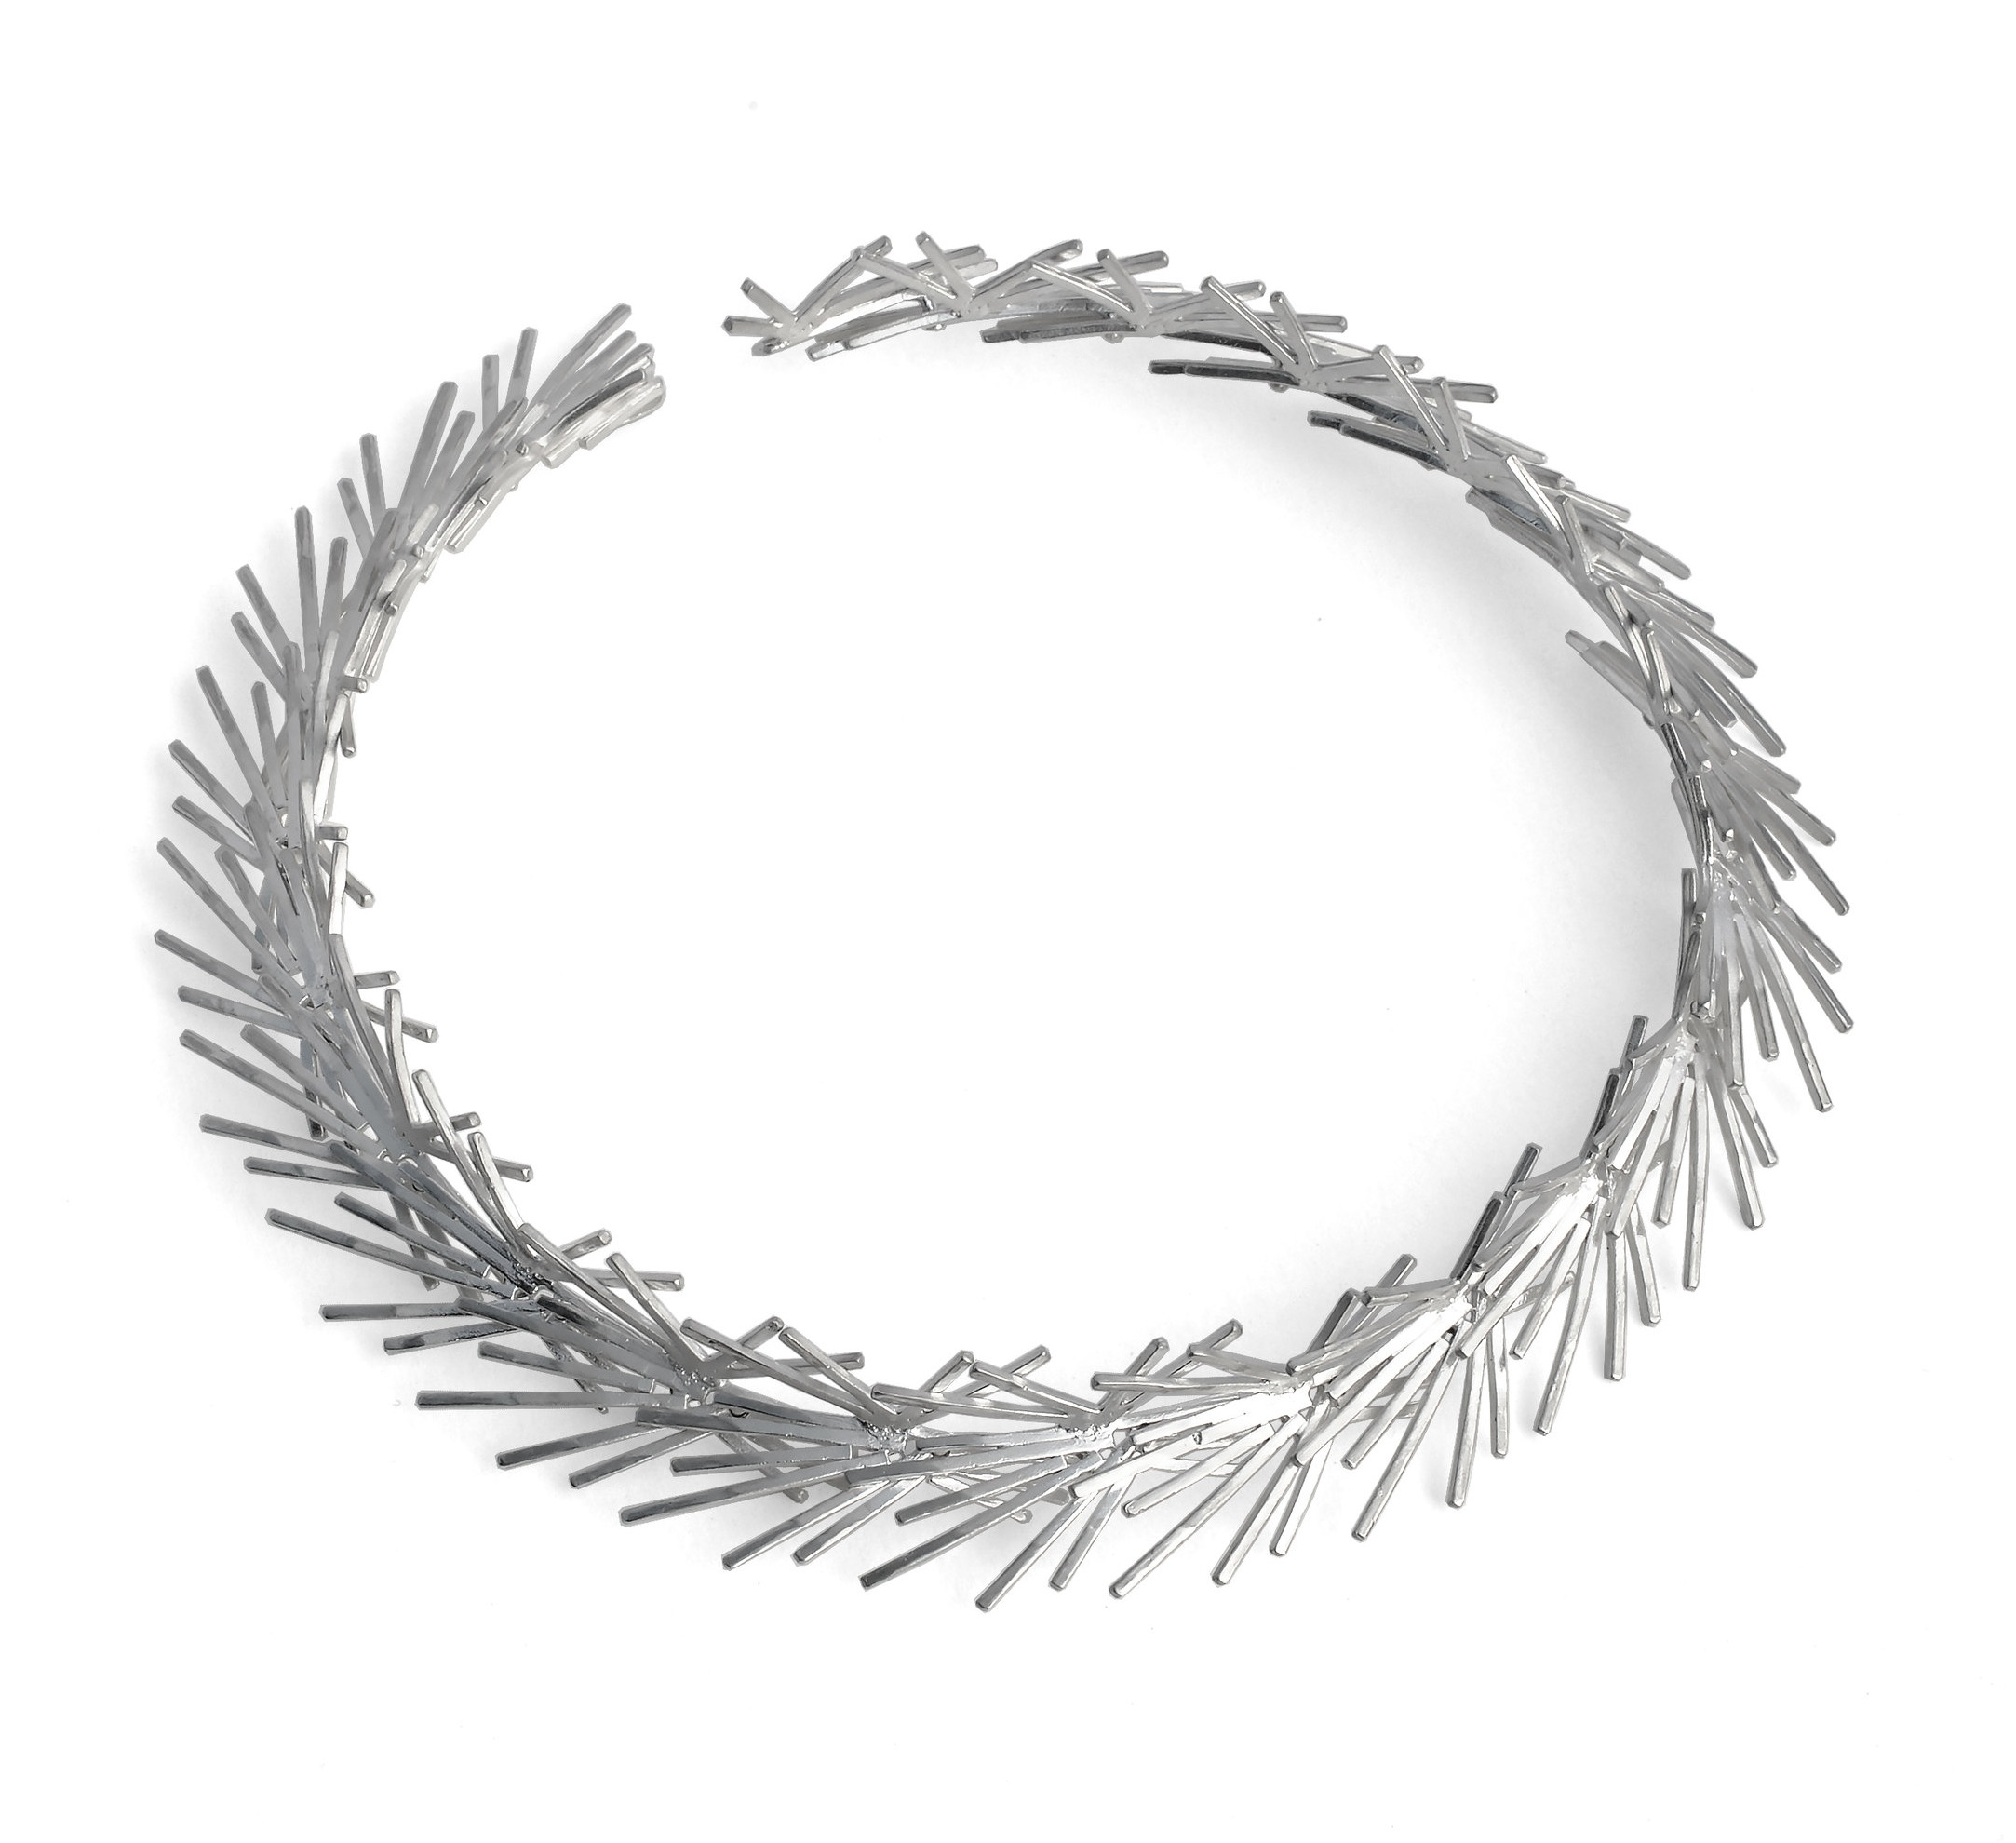 Wreath Necklace |  Silver 925